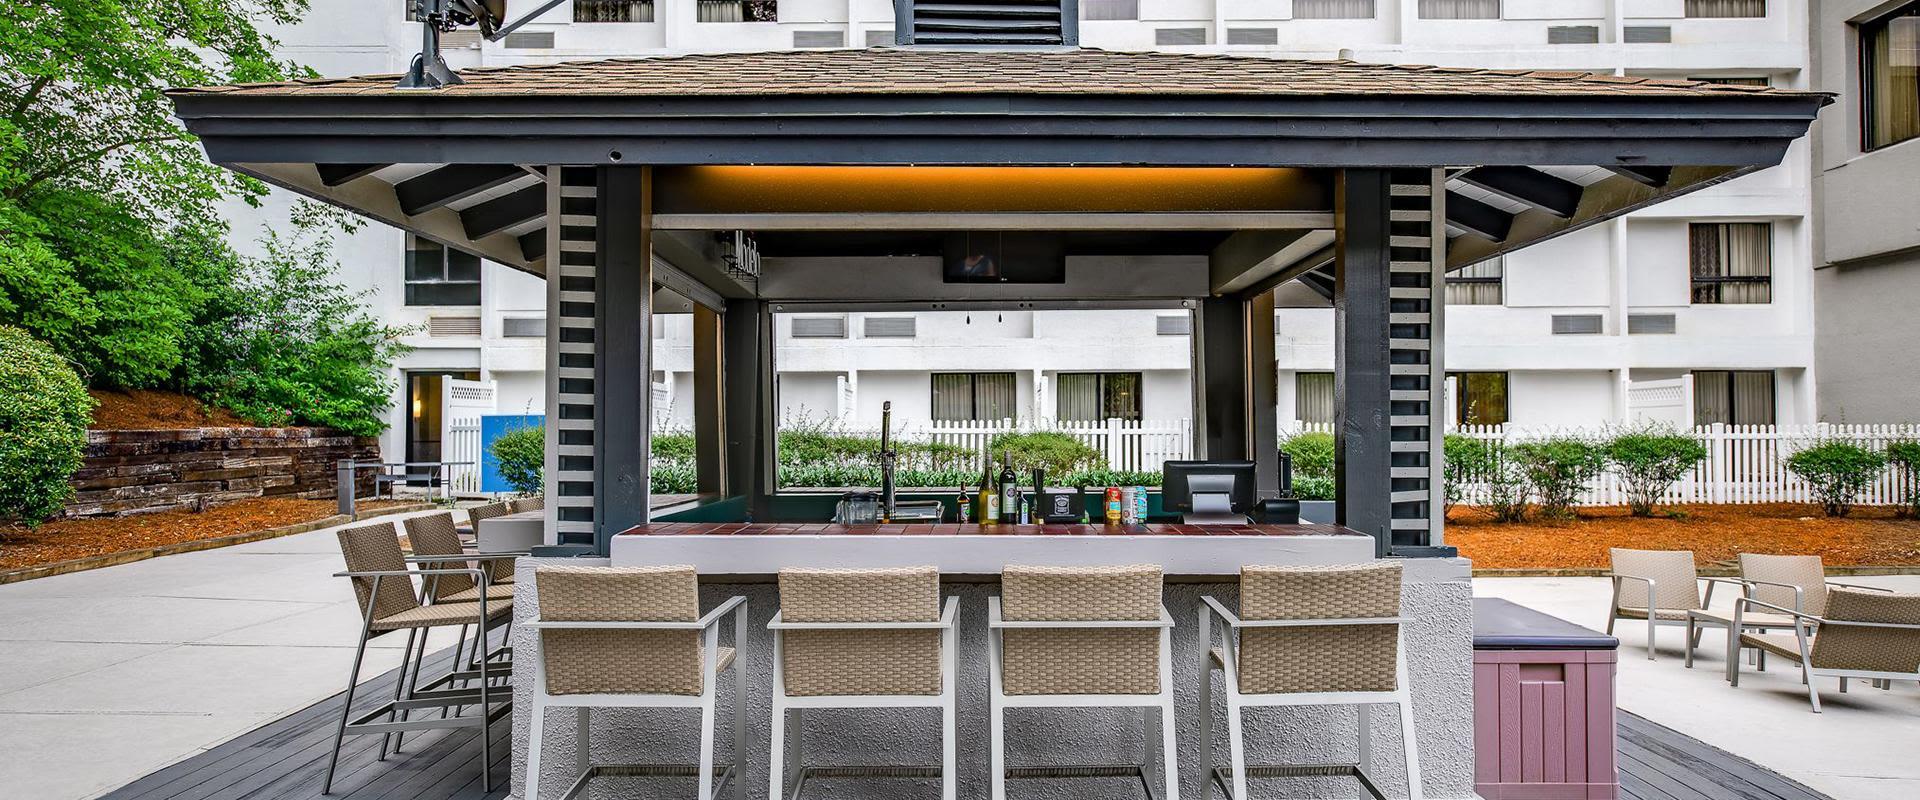 Charlotte NC Hotel Outdoor Pool Bar